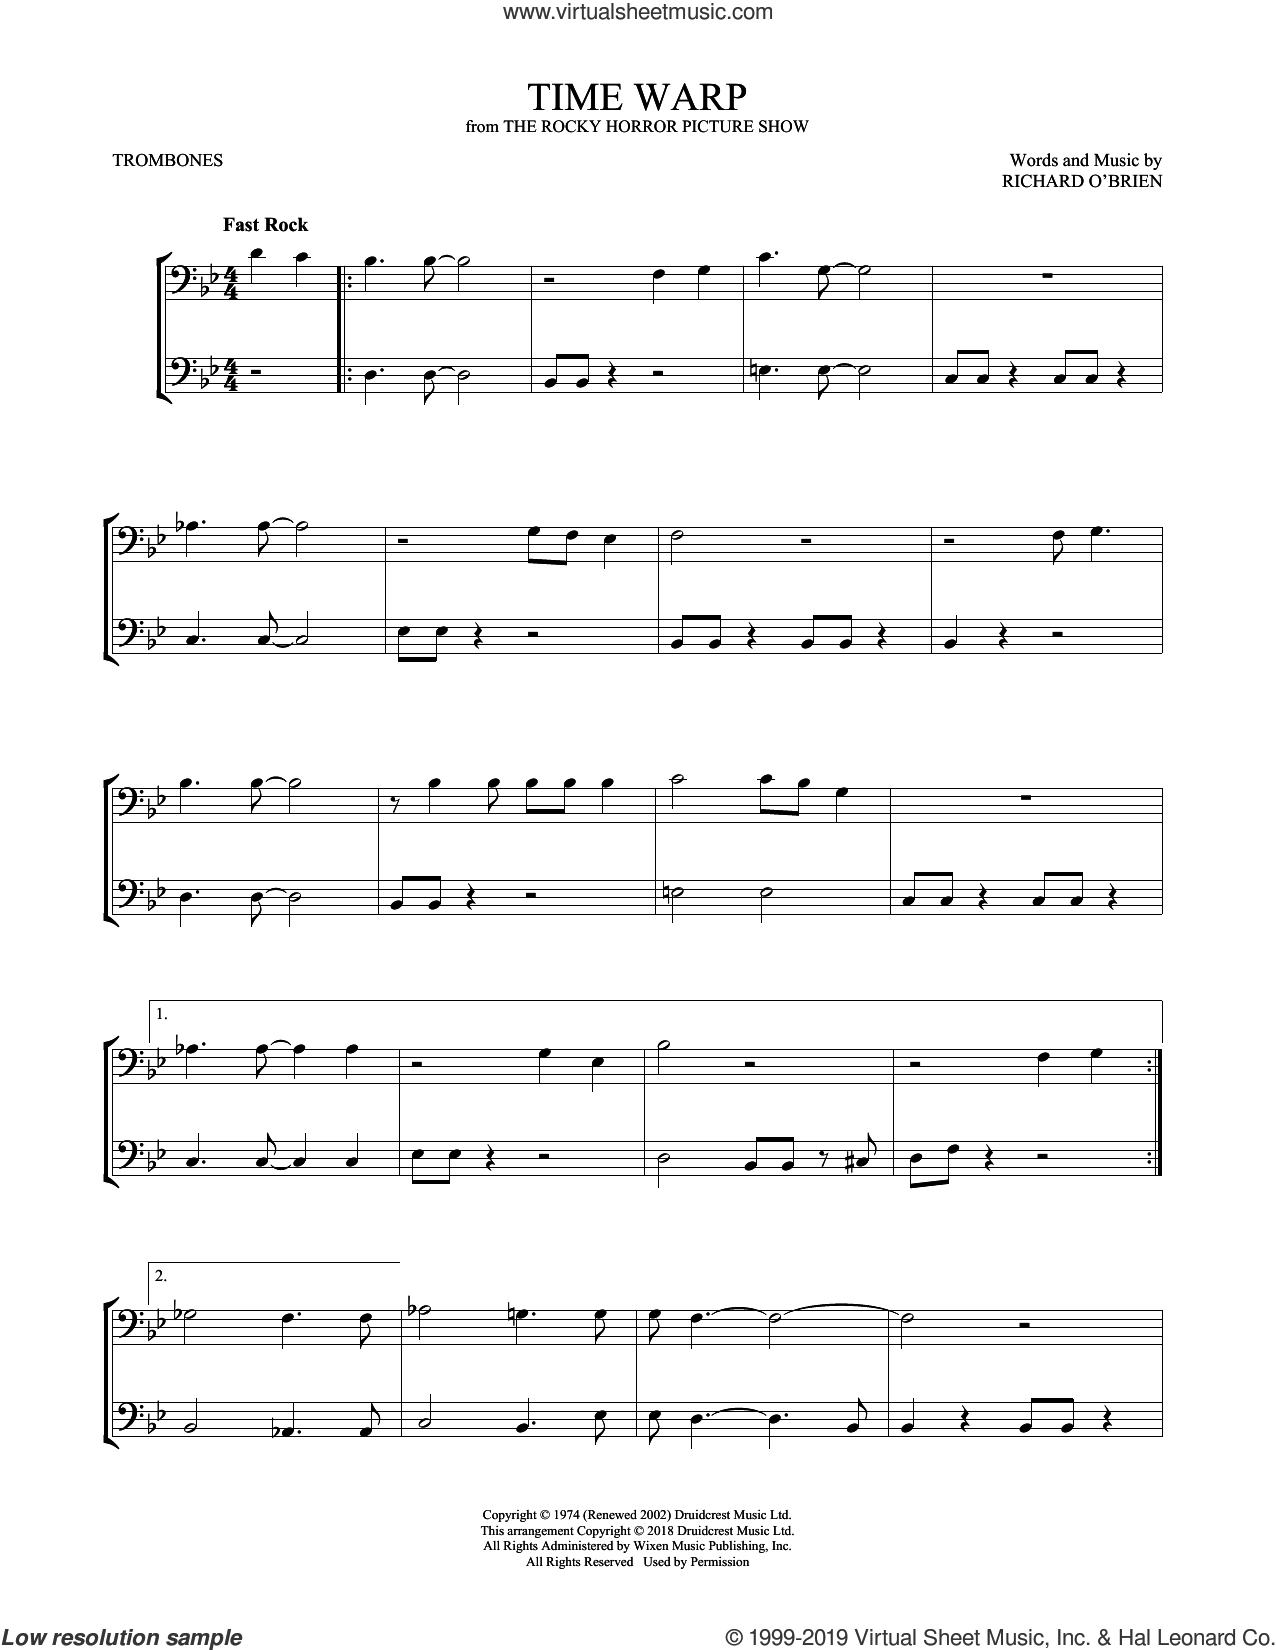 Time Warp sheet music for two trombones (duet, duets) by Richard O'Brien, intermediate skill level